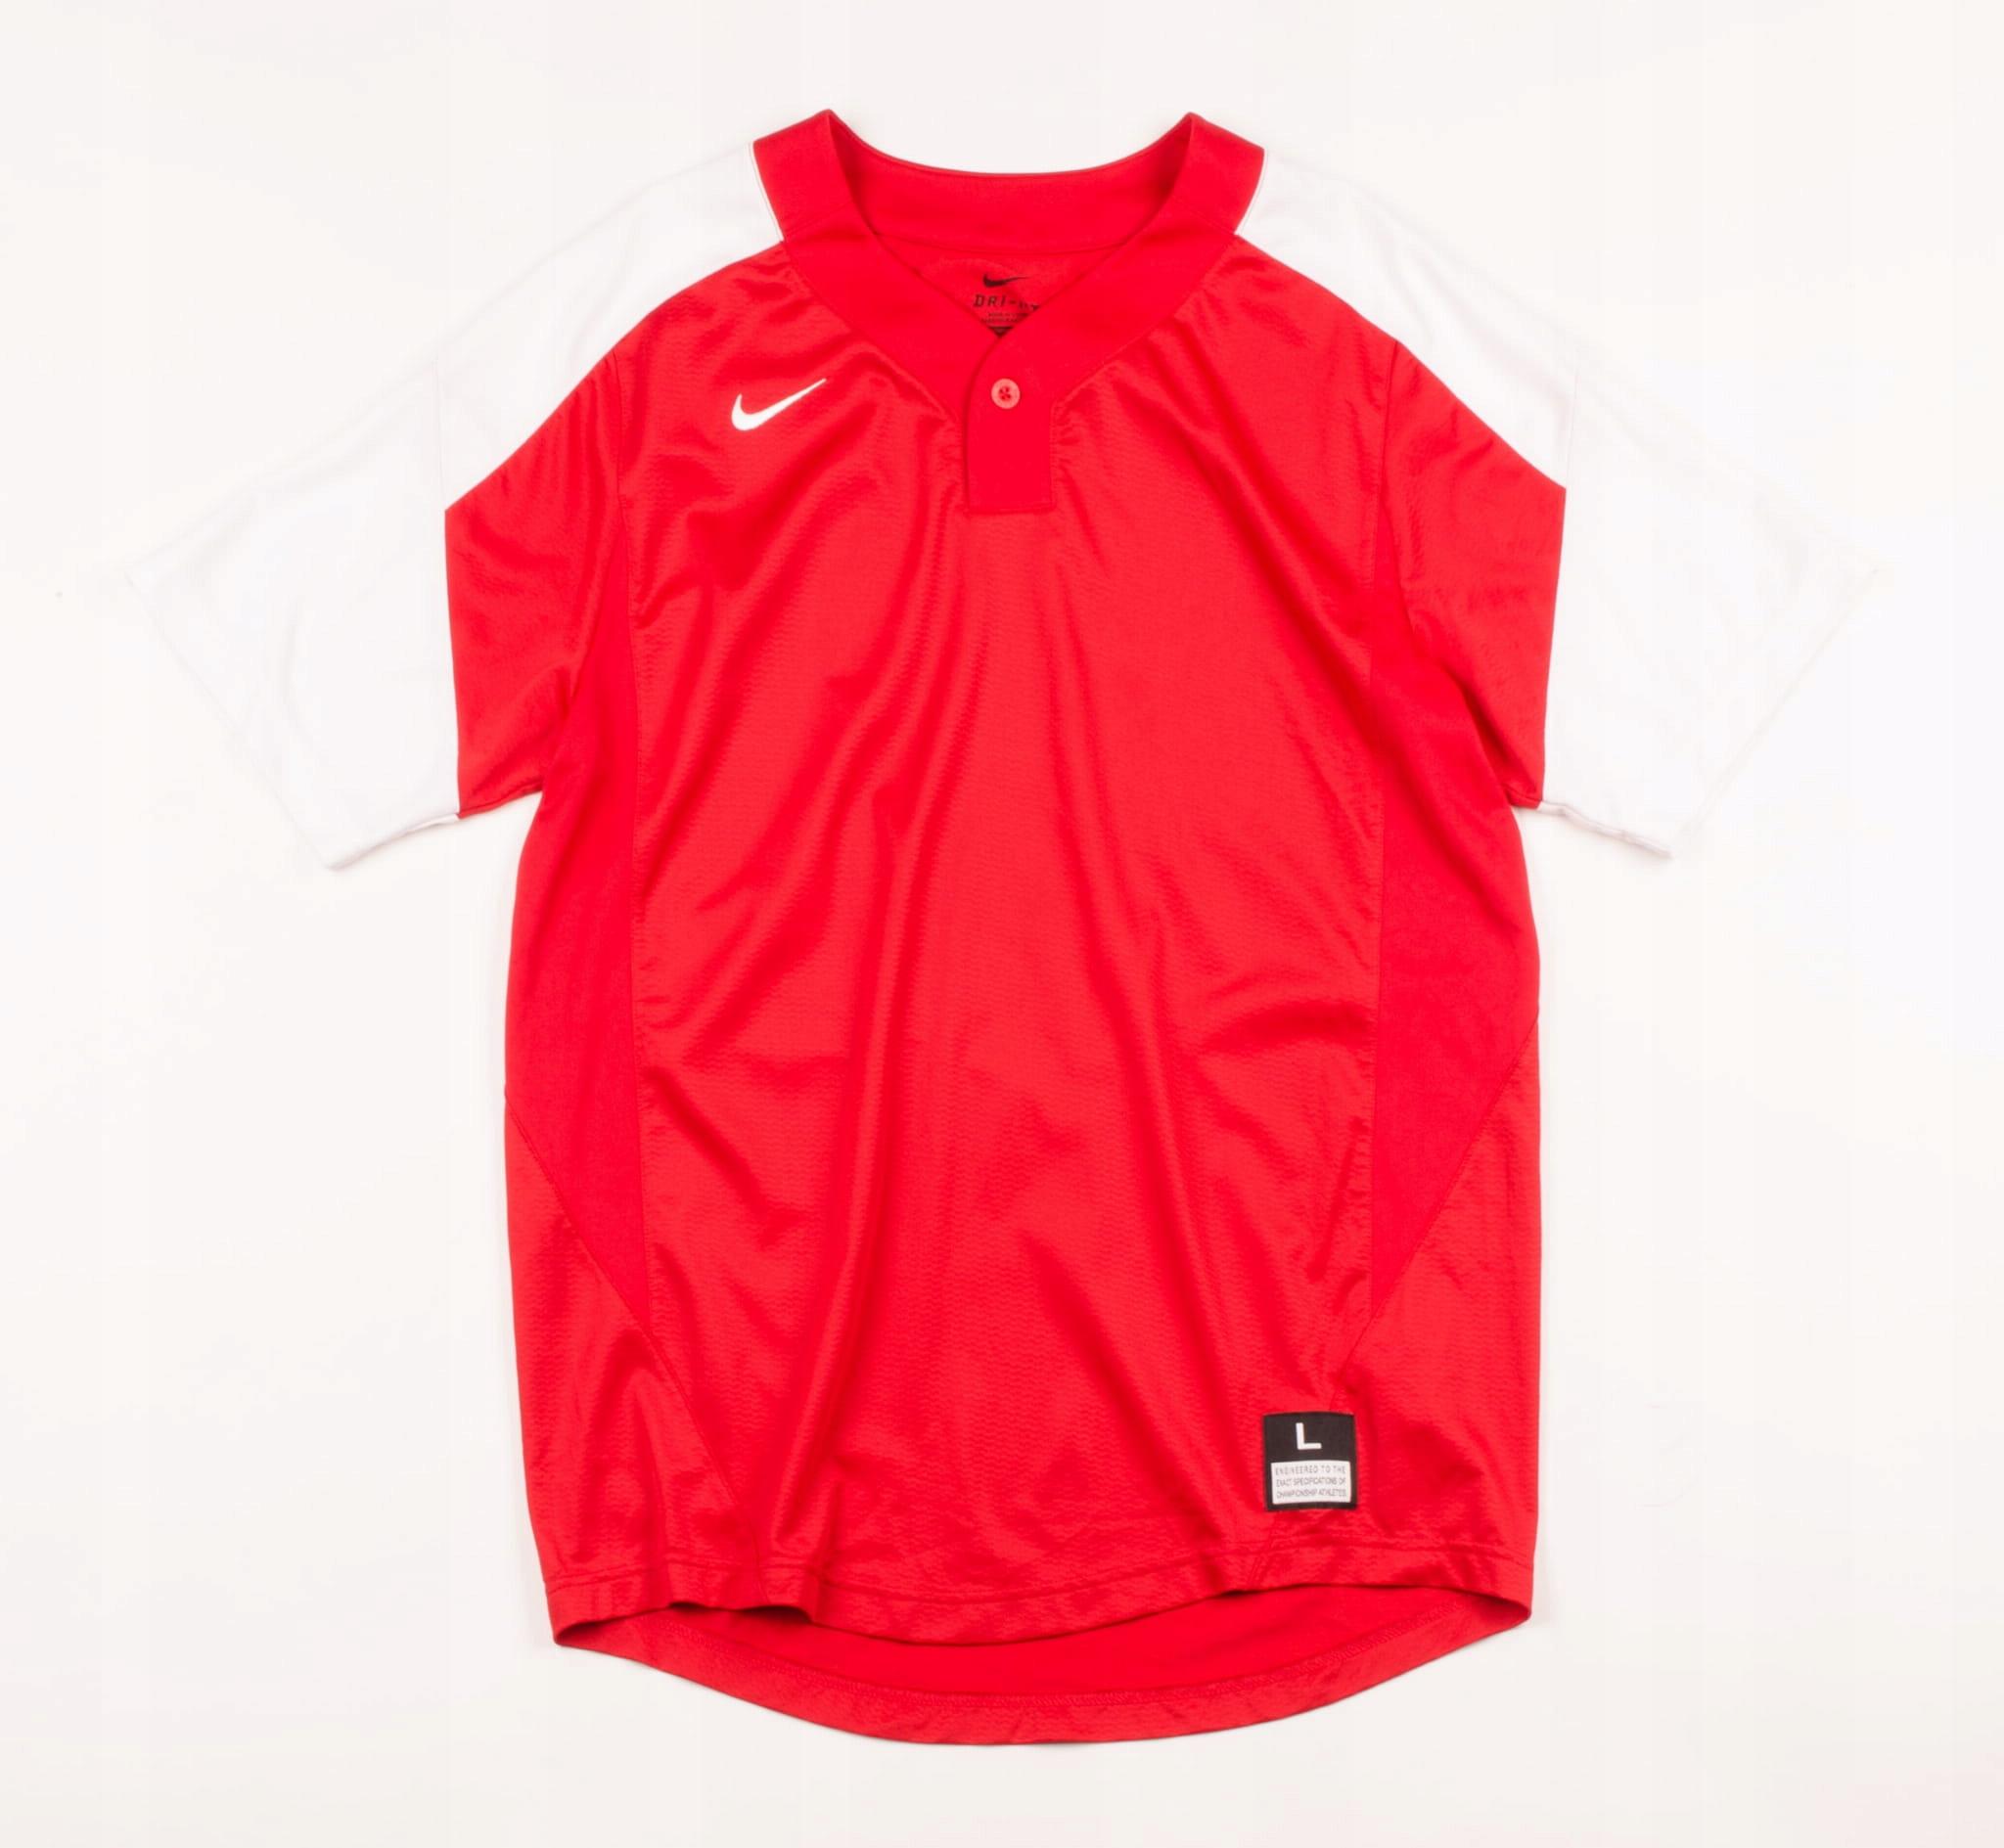 27096 Nike Koszulka Sportowa Męska L